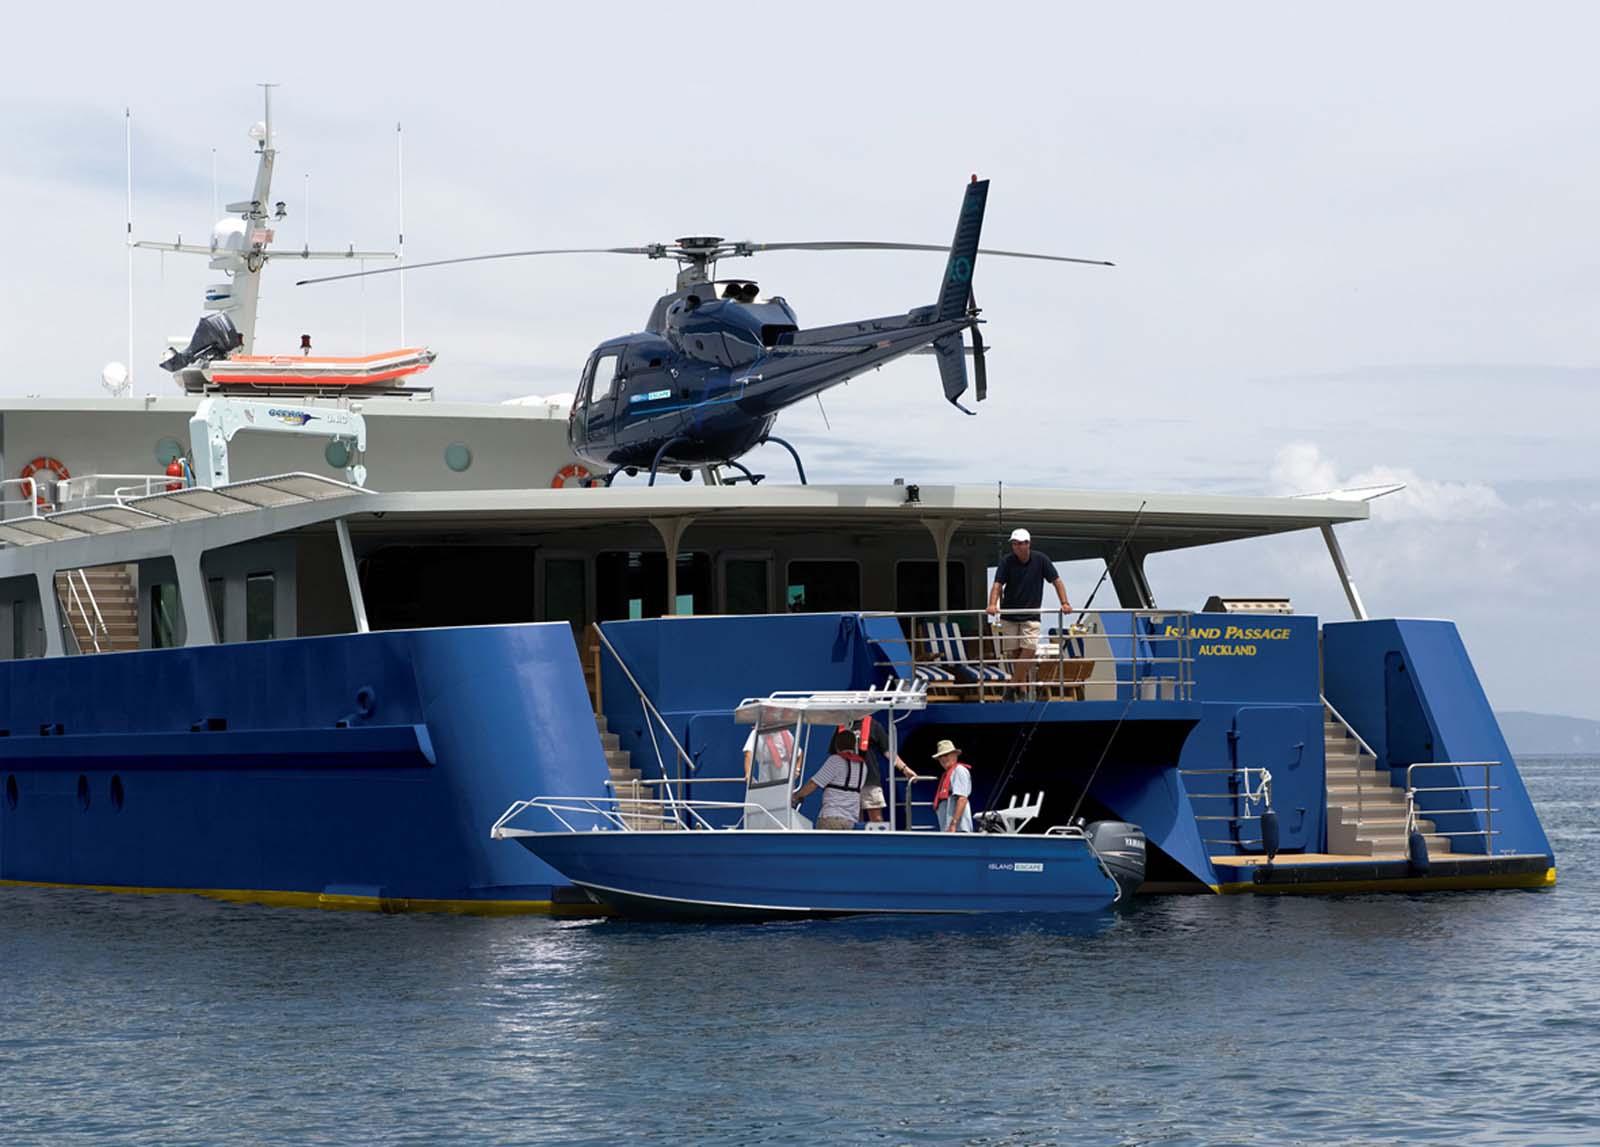 island passage yacht charter details luxury motor. Black Bedroom Furniture Sets. Home Design Ideas